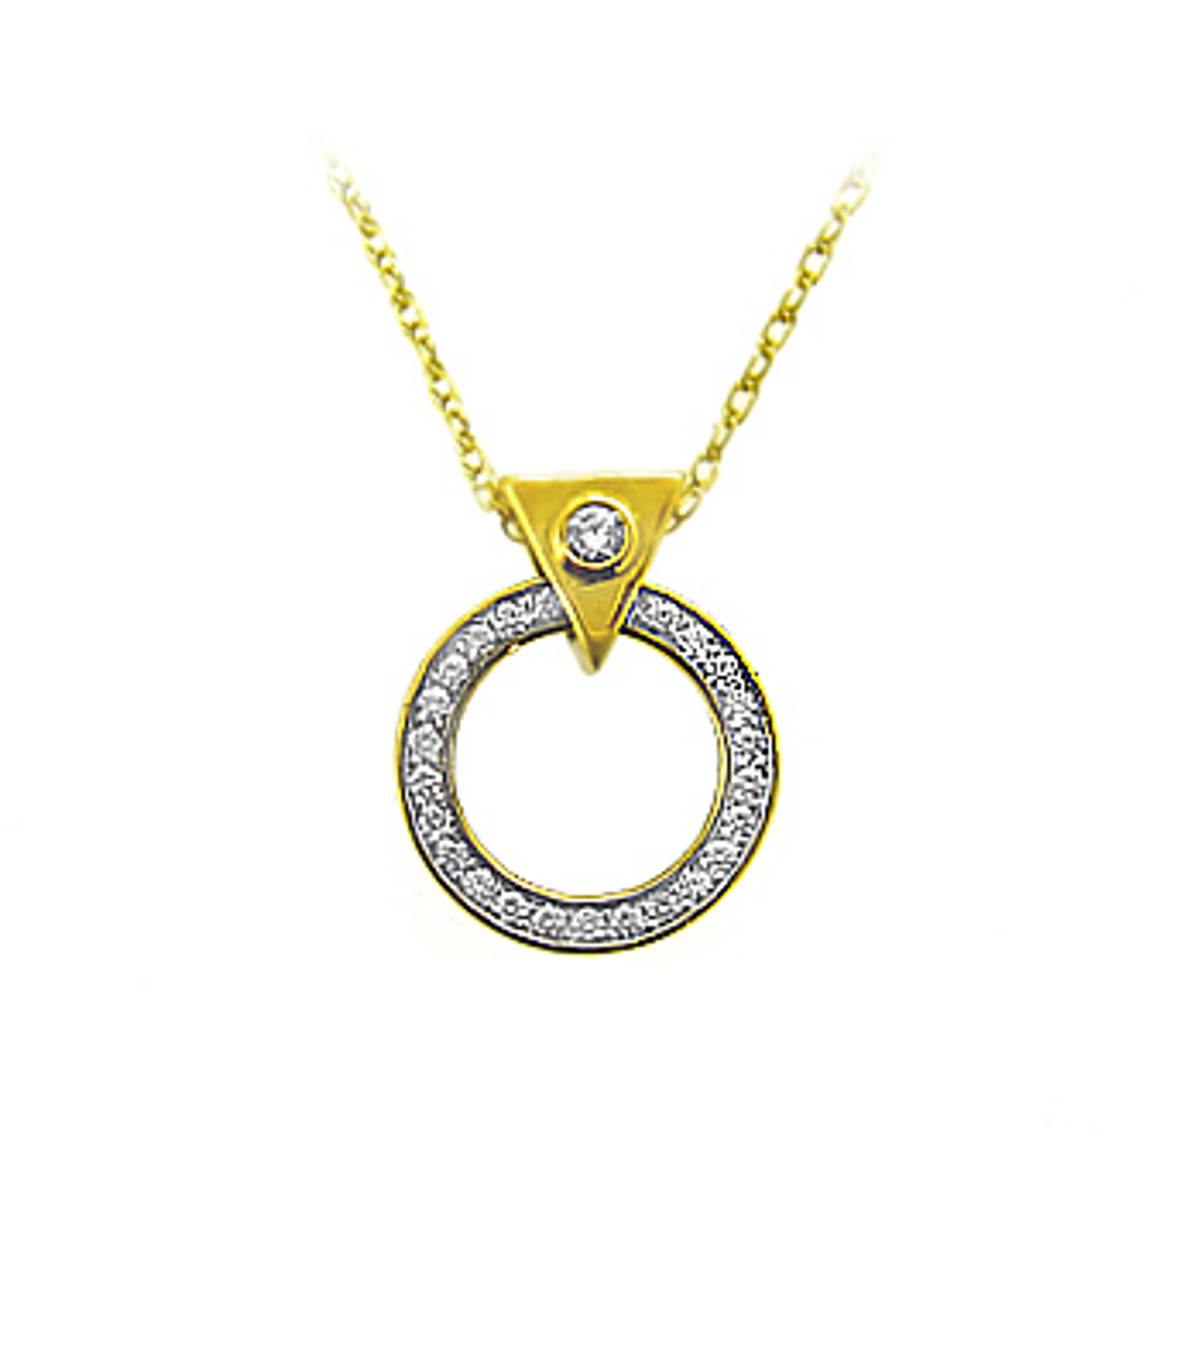 "9k yellow gold brilliant cut diamond horseshoe pendant on 9k yellow gold 18"" chainDETAILSCarat: total diamond weight 0.30cts  Pendant length 1.8cmPendant width 1.5cm"